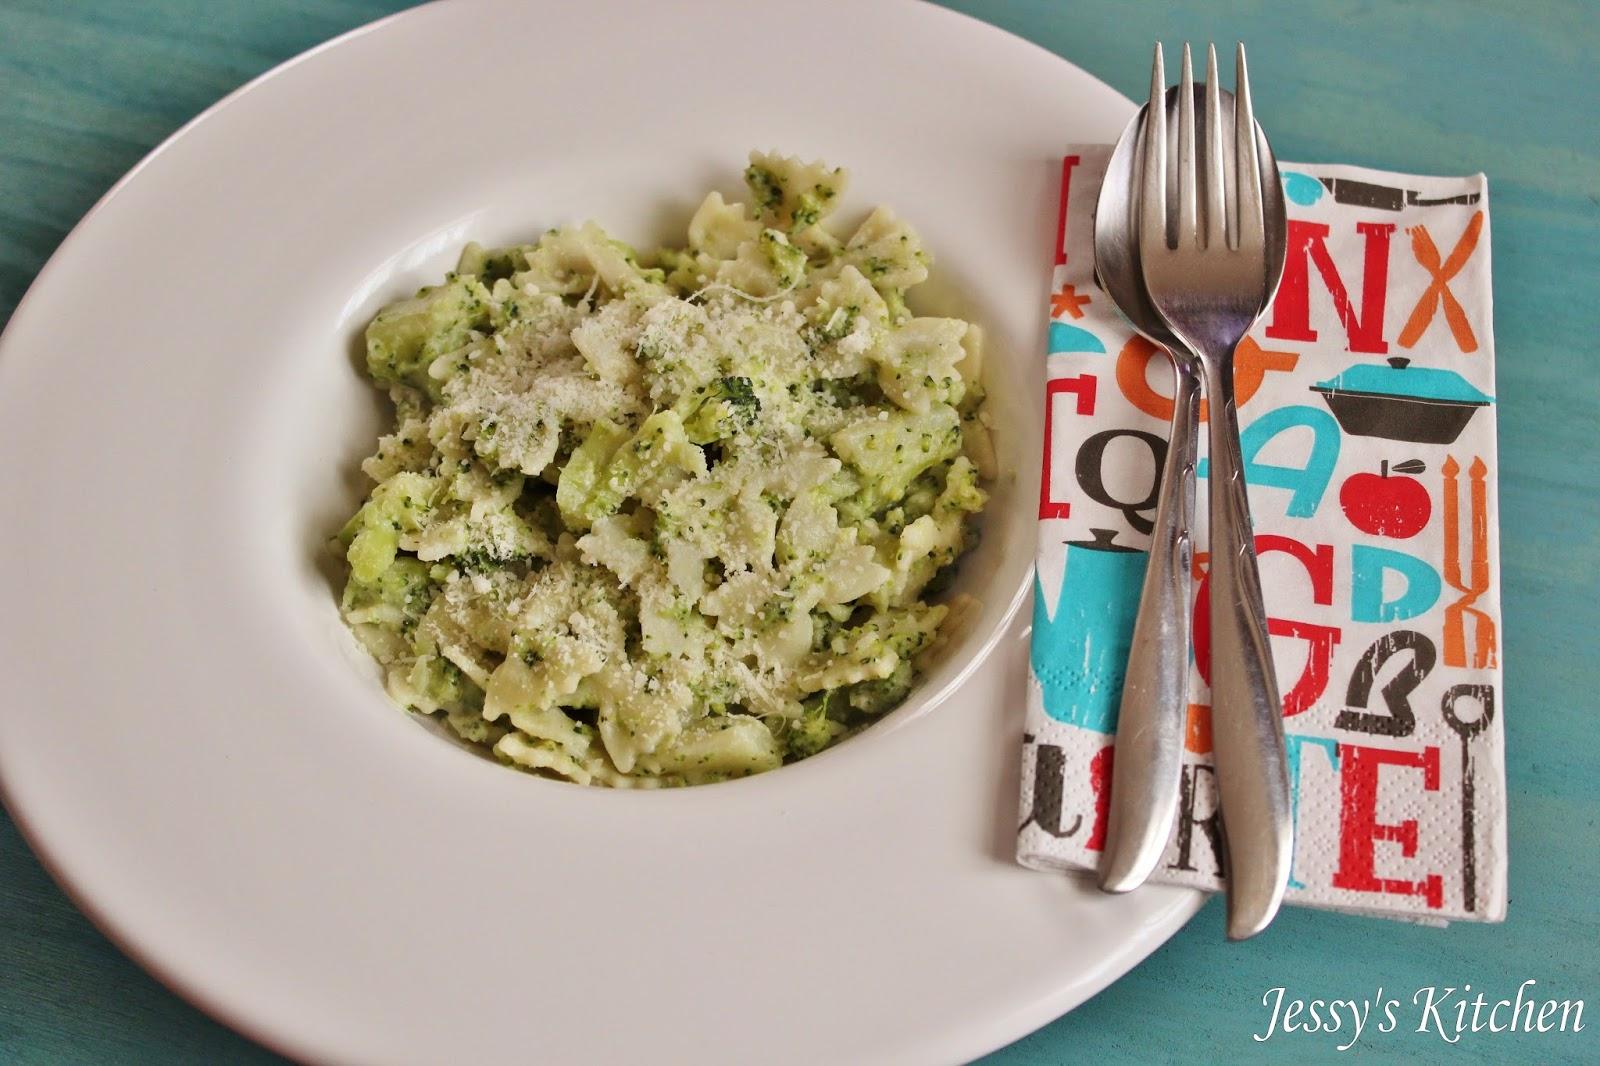 jessy 39 s kitchen p tes aux brocolis fa on jamie oliver. Black Bedroom Furniture Sets. Home Design Ideas